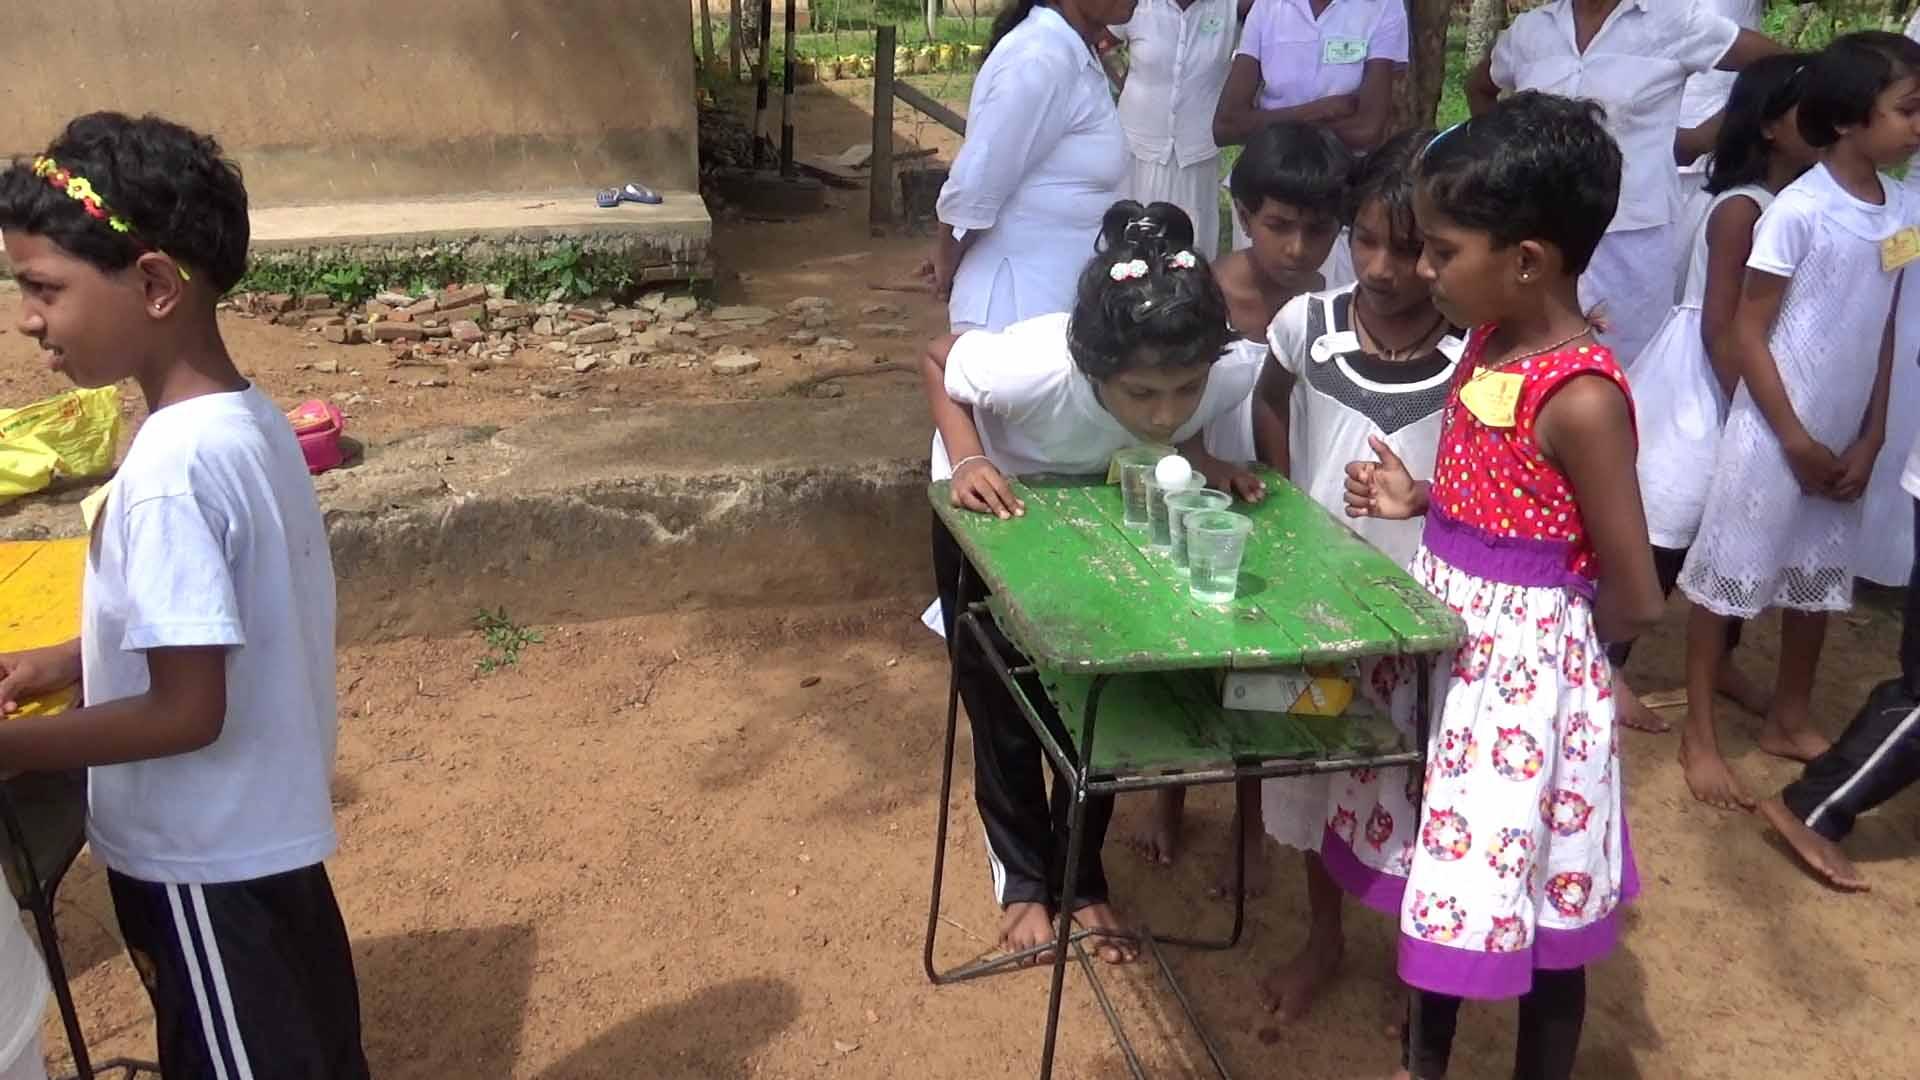 Sati Pasala Mindfulness Camp at Meethirigala Kanishta Vidyalaya-mindful games (5)